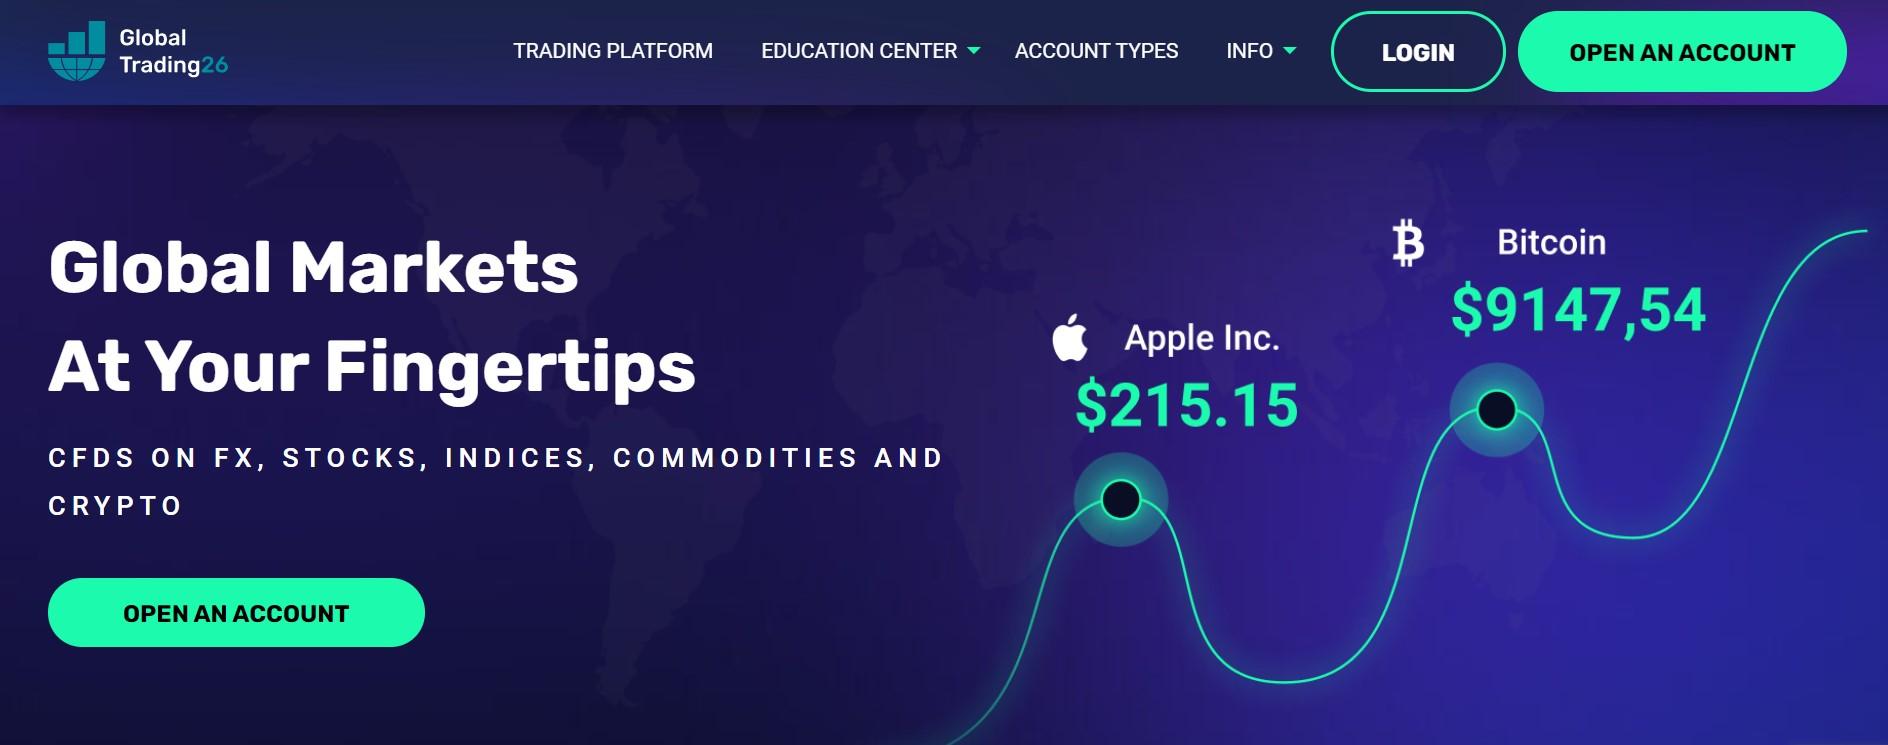 Global Trading 26 website